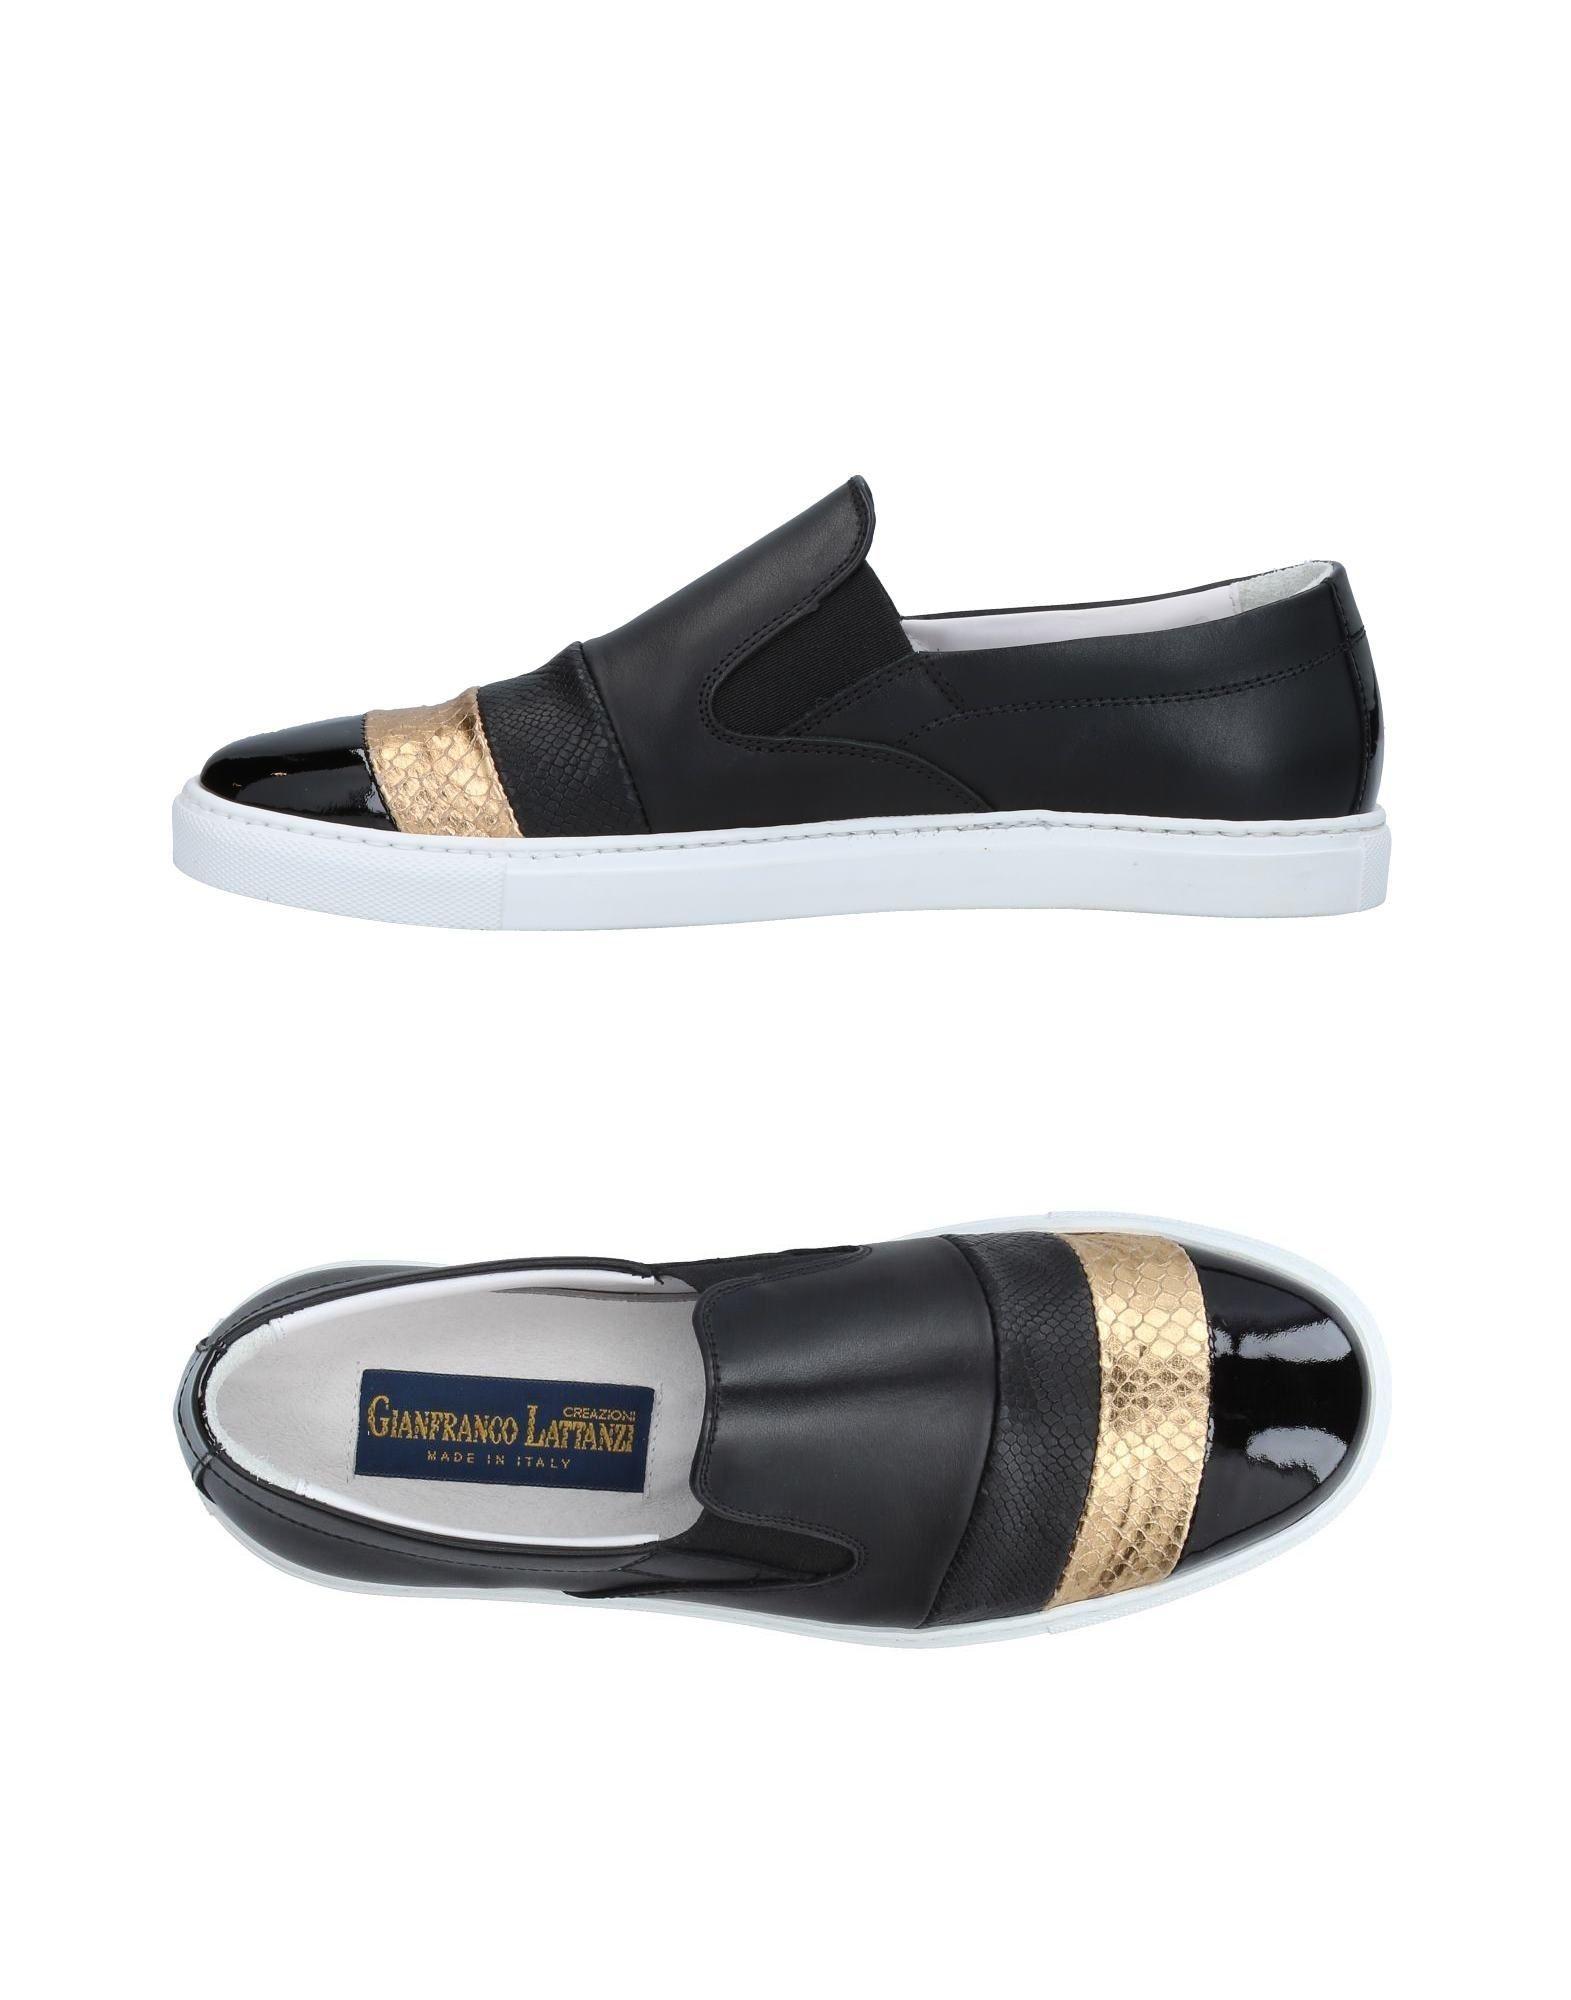 Gianfranco Lattanzi Sneakers Damen  11414153EF Gute Qualität beliebte Schuhe